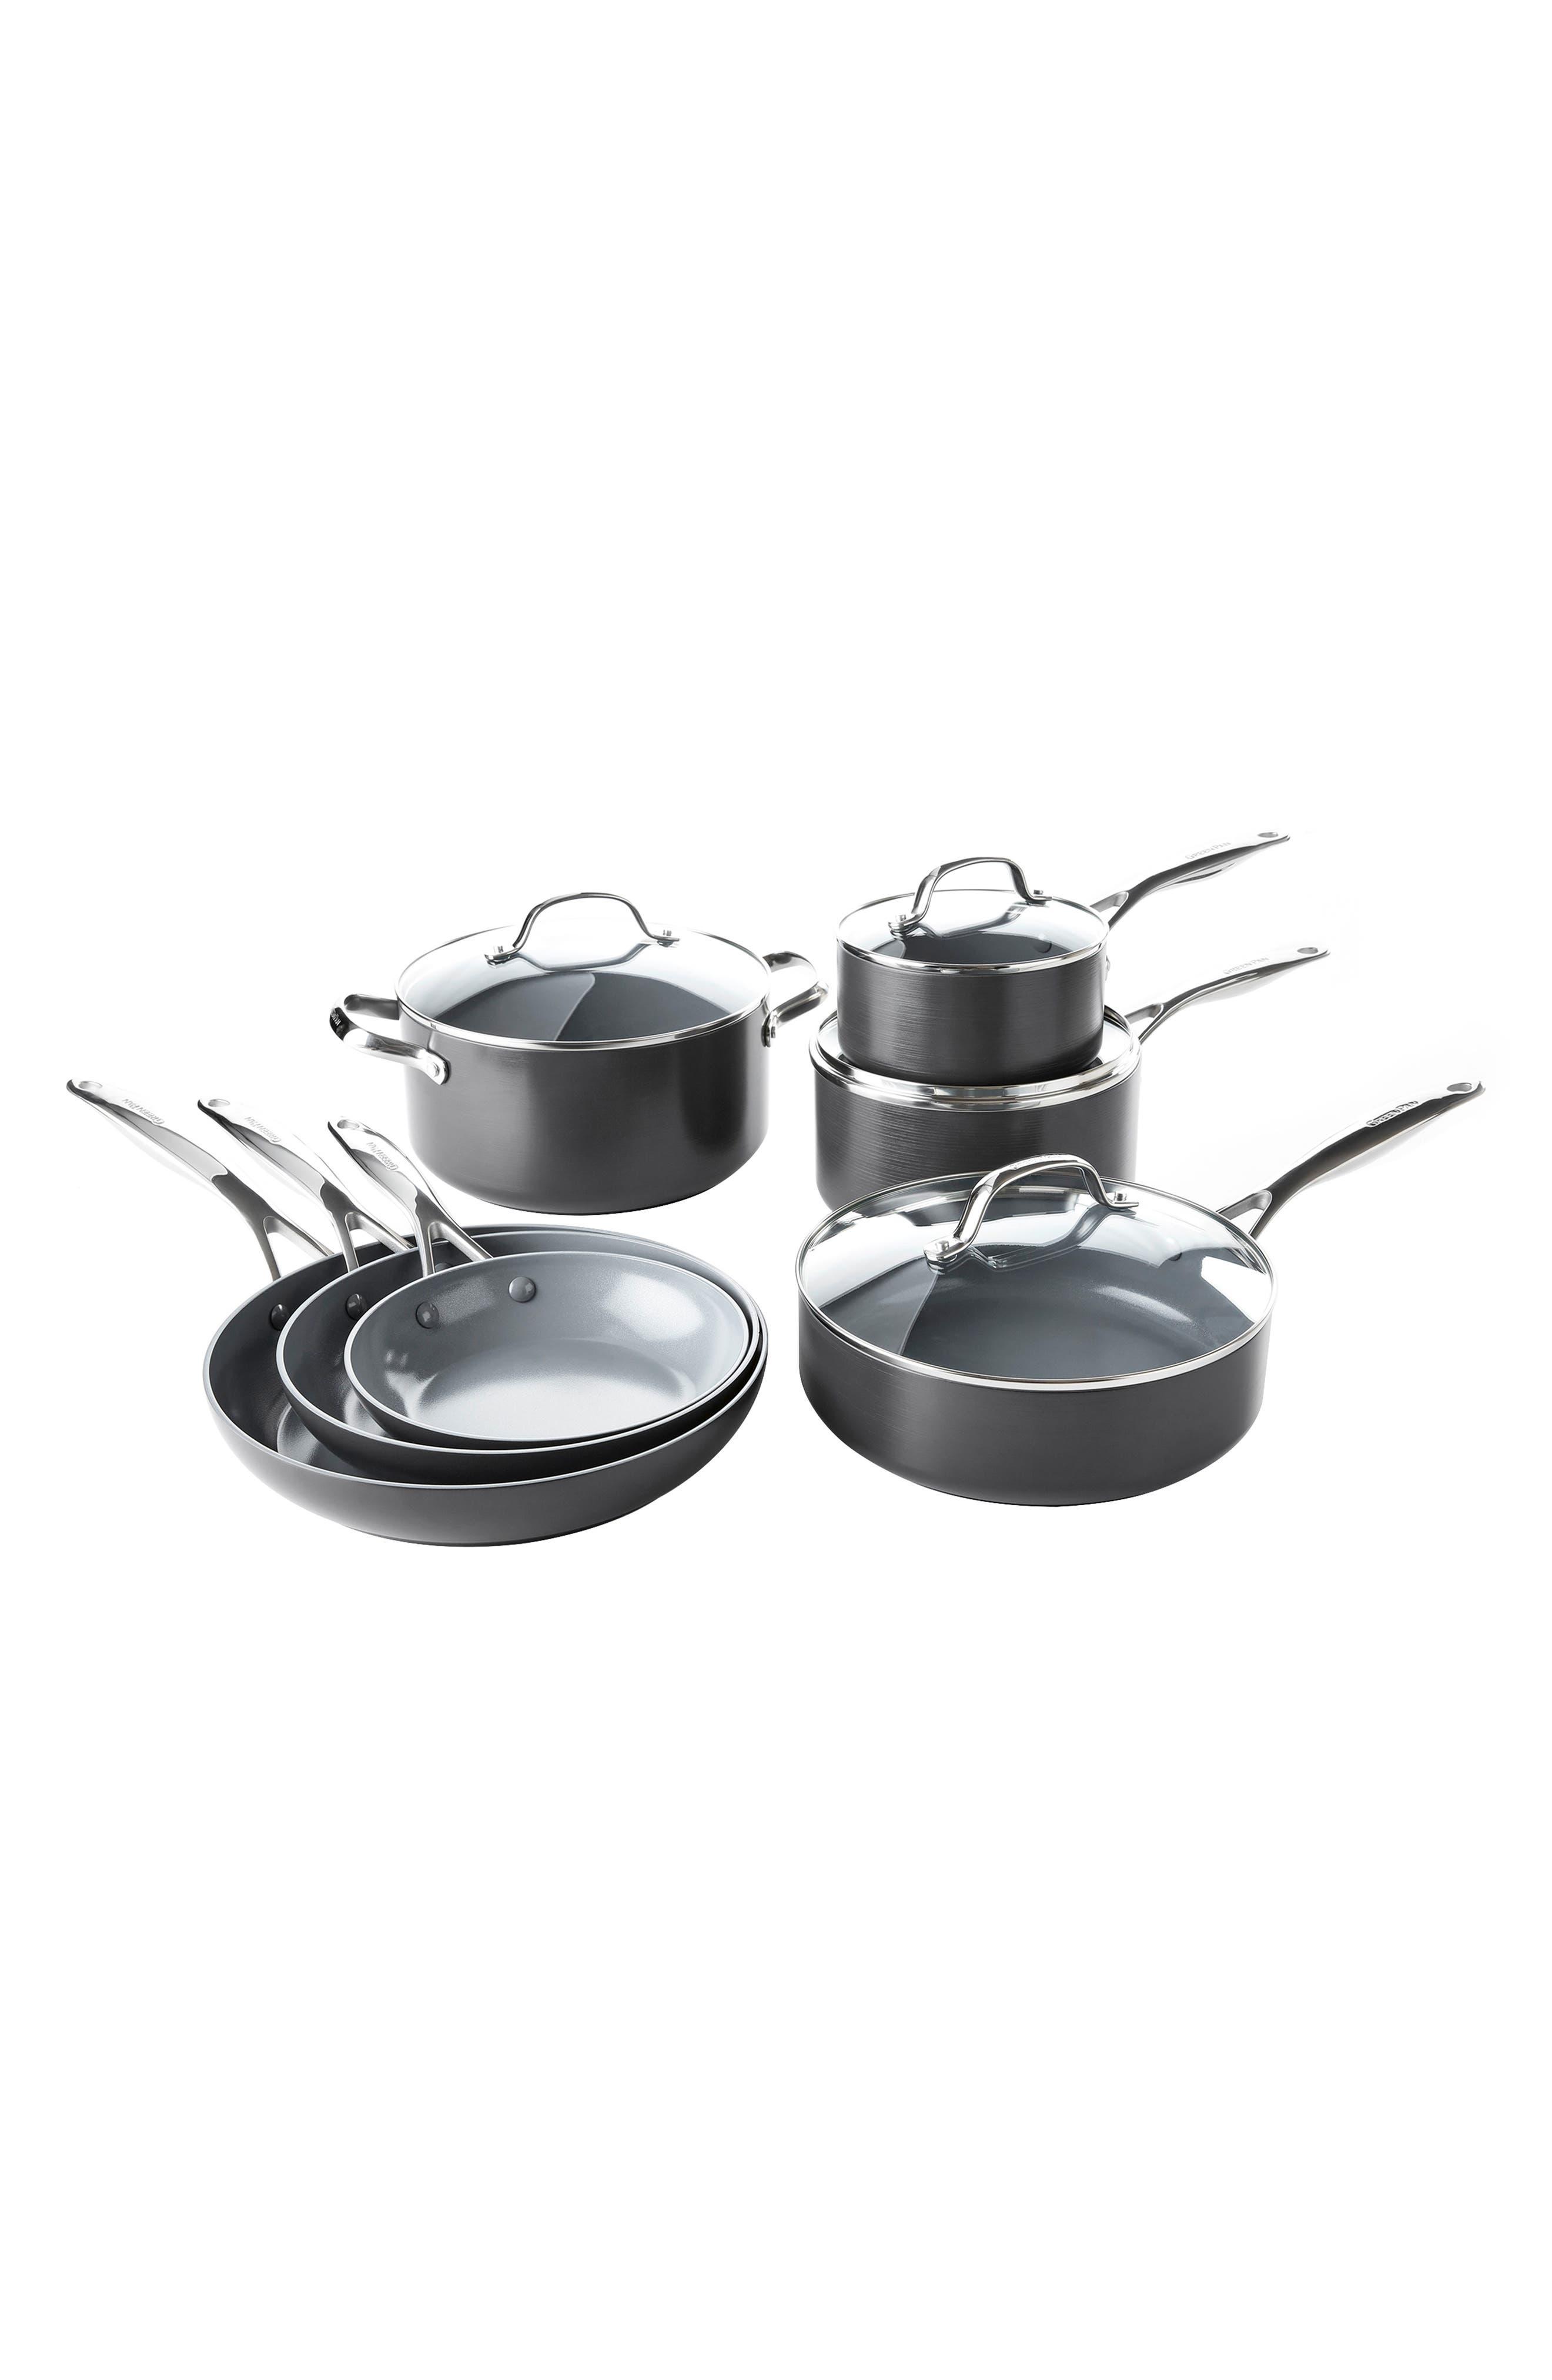 Valencia Pro 11-Piece Anodized Aluminum Ceramic Nonstick Cookware Set,                         Main,                         color, Black